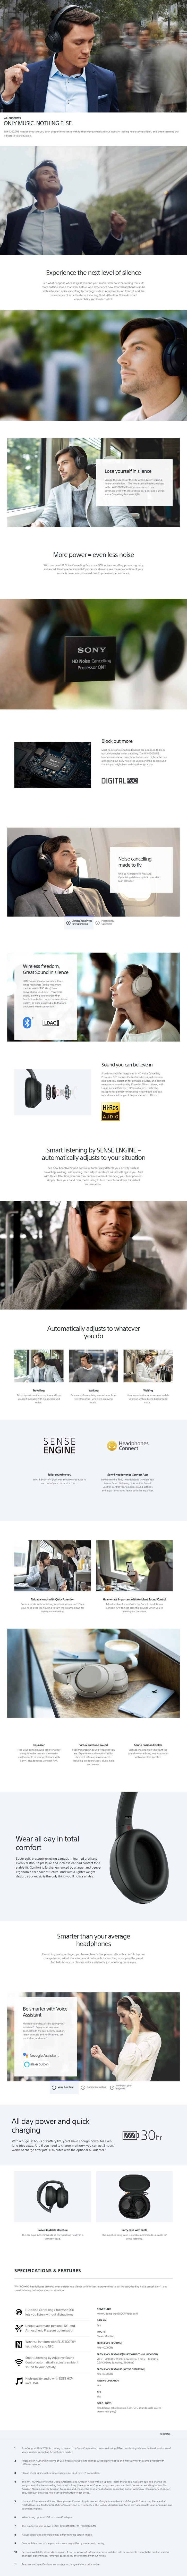 Sony WH-1000XM3 NC Bluetooth Headphones - Black - Desktop Overview 1